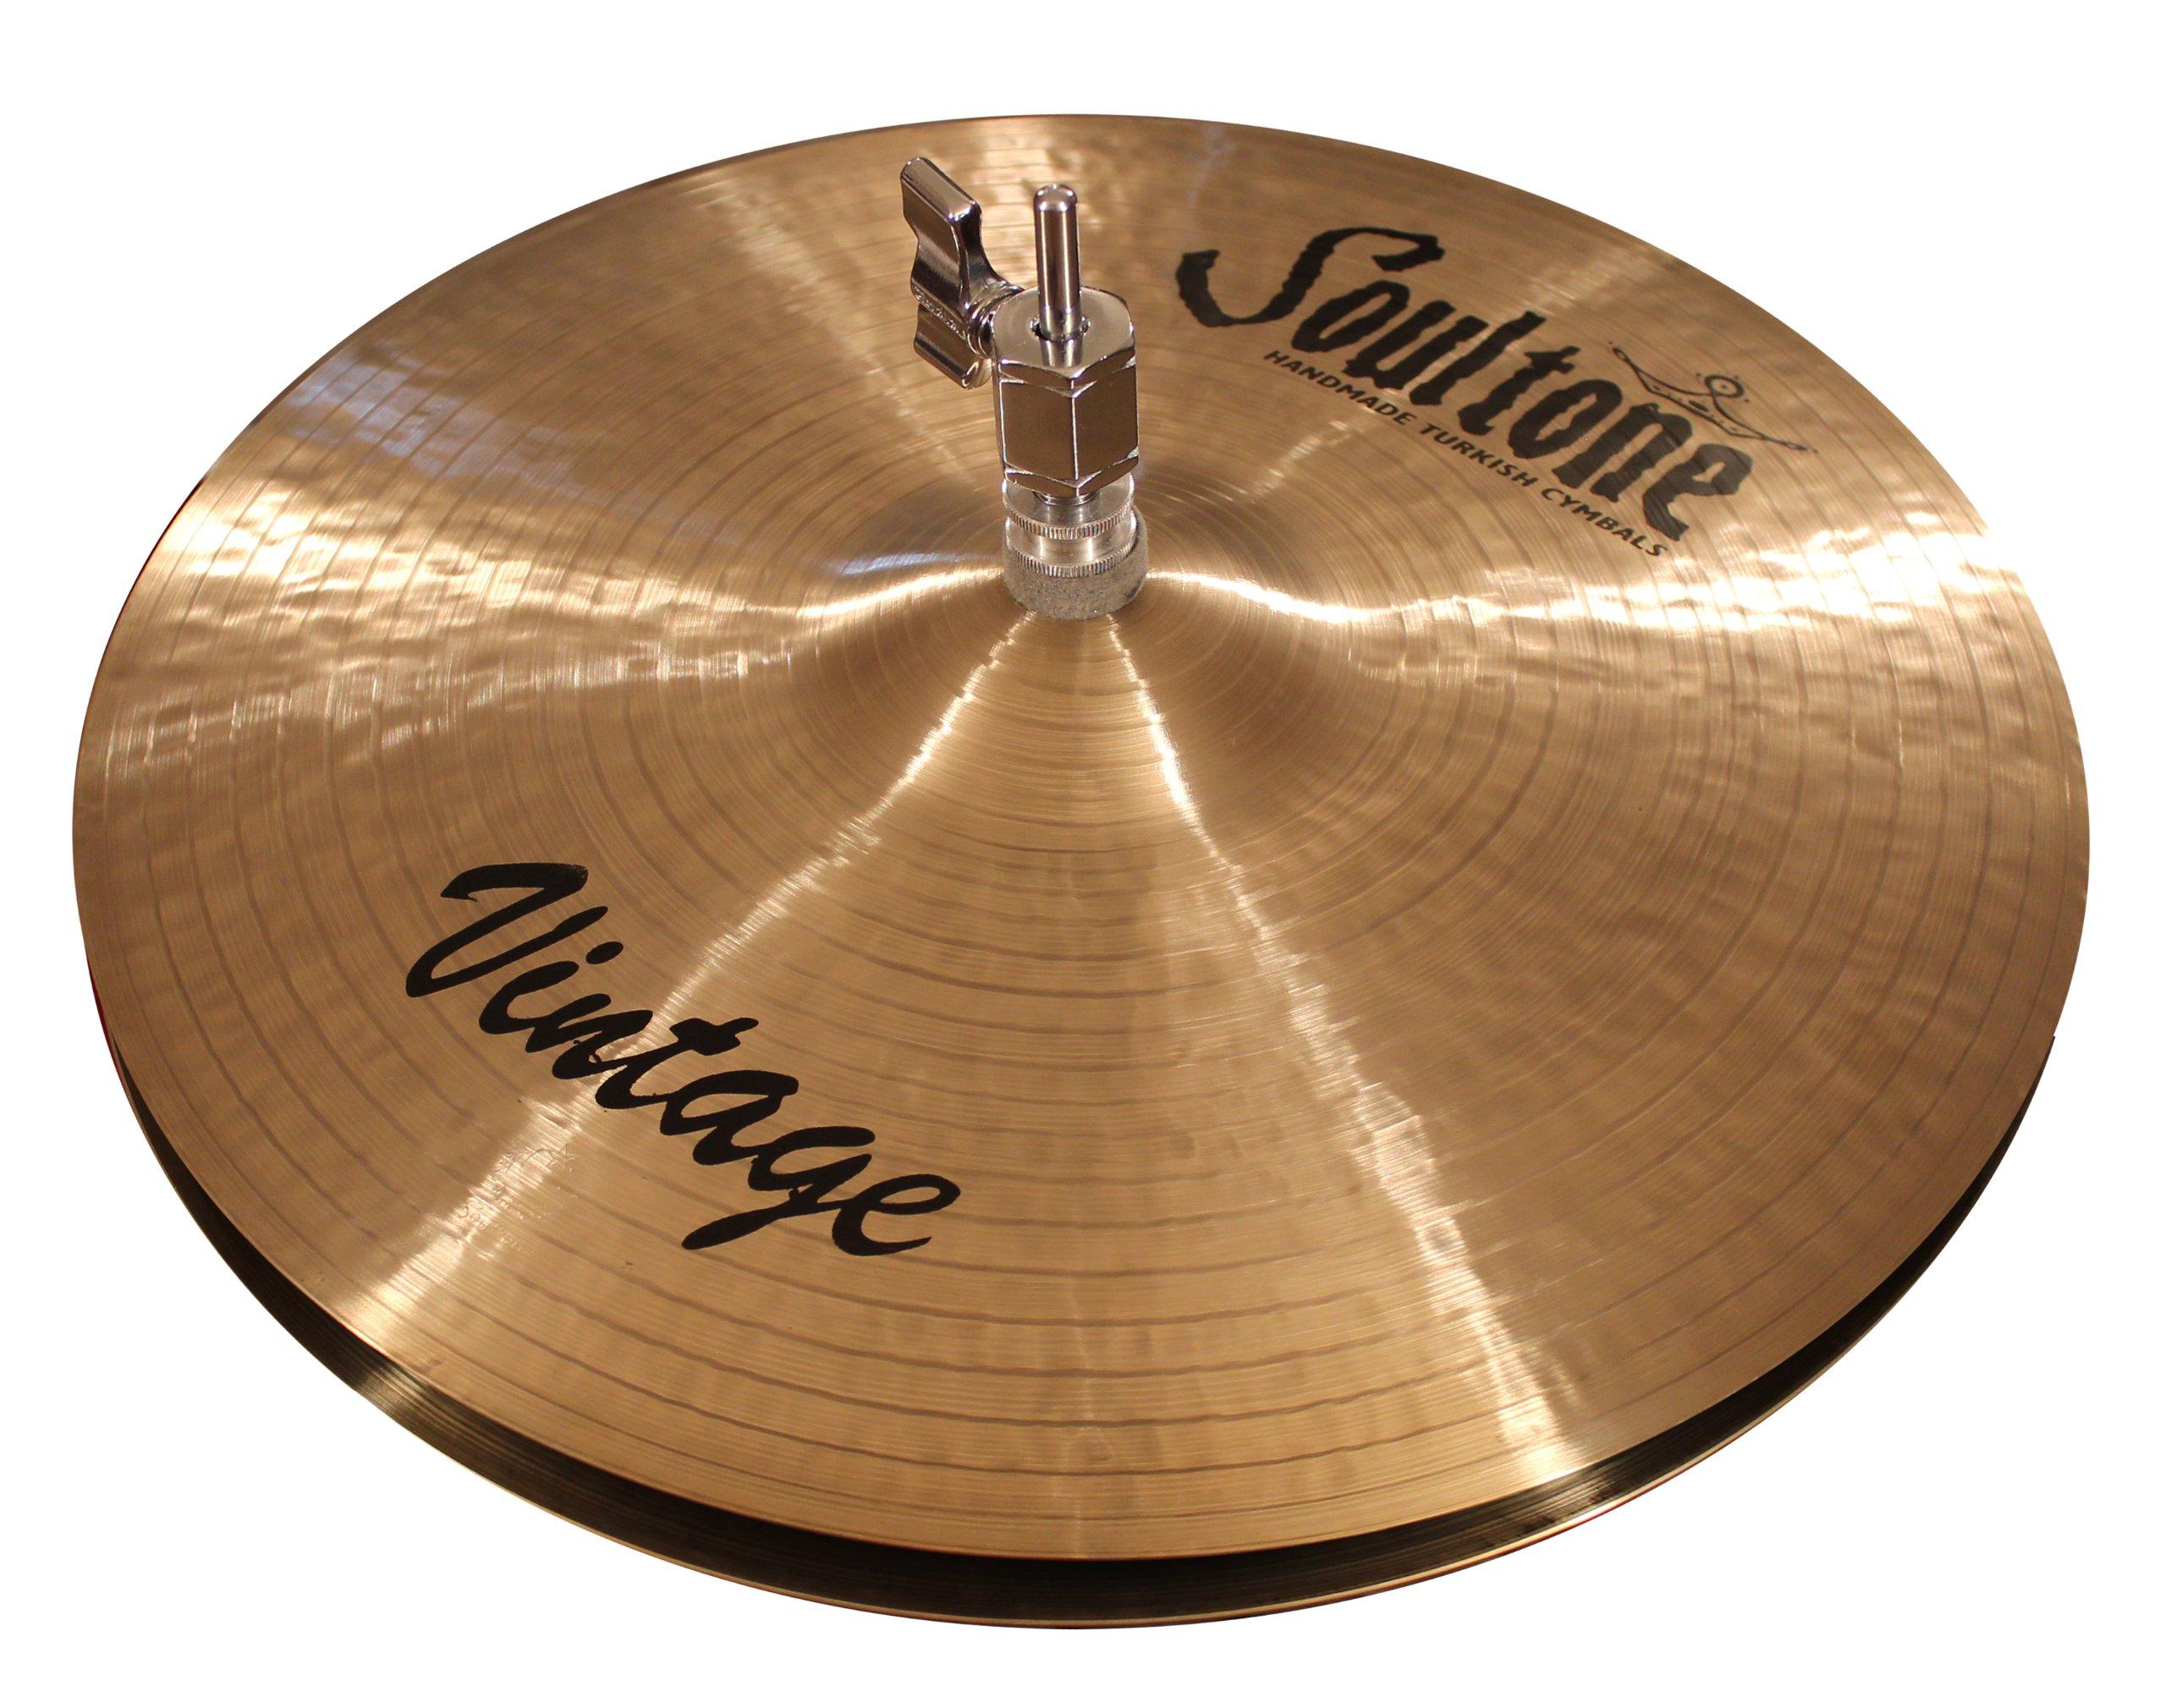 Soultone Cymbals VNT-HHT14-14'' Vintage Hi Hats Pair